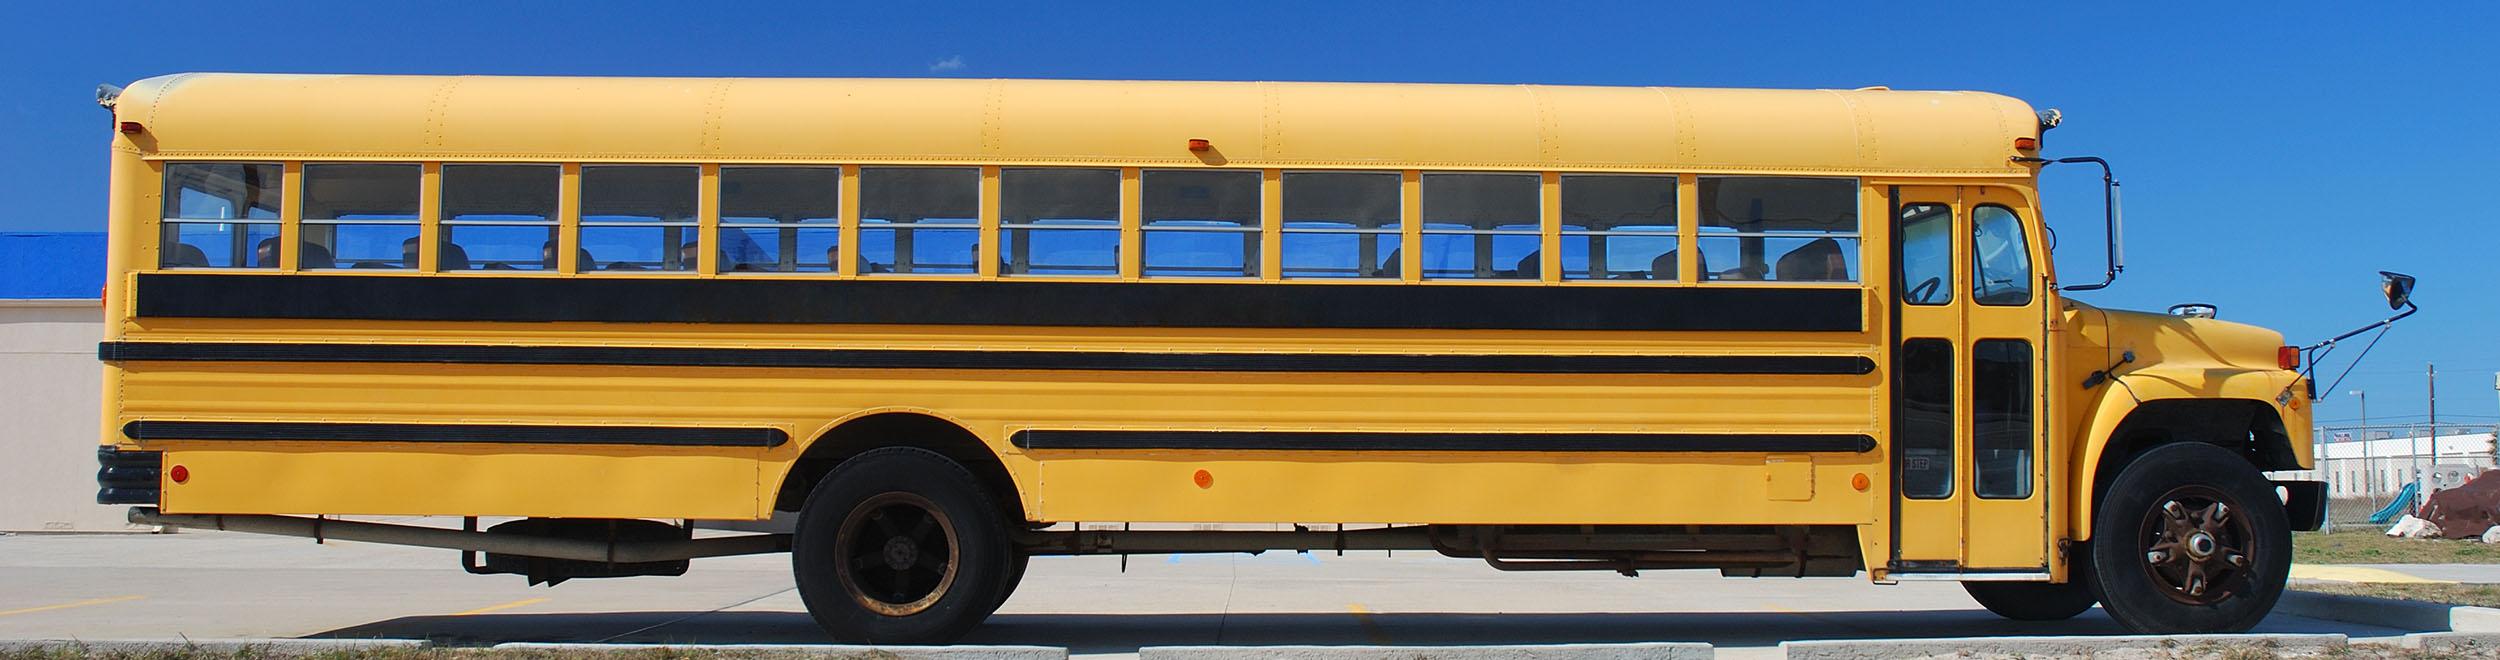 Bus Transportatation Insider Advice